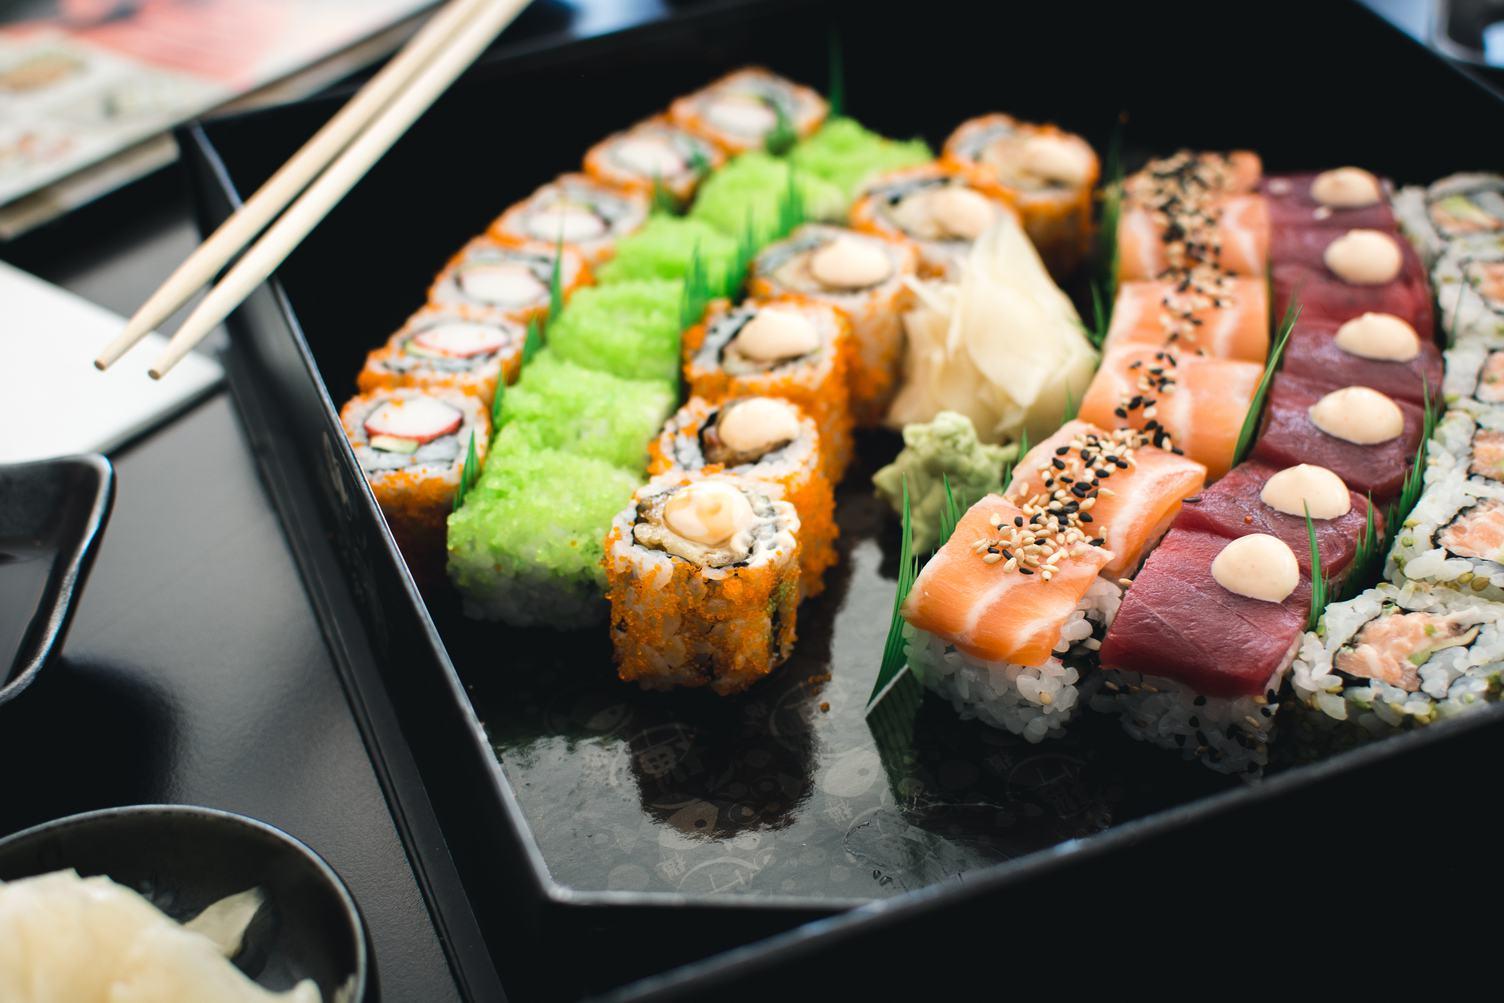 Sushi Set in a Black Box